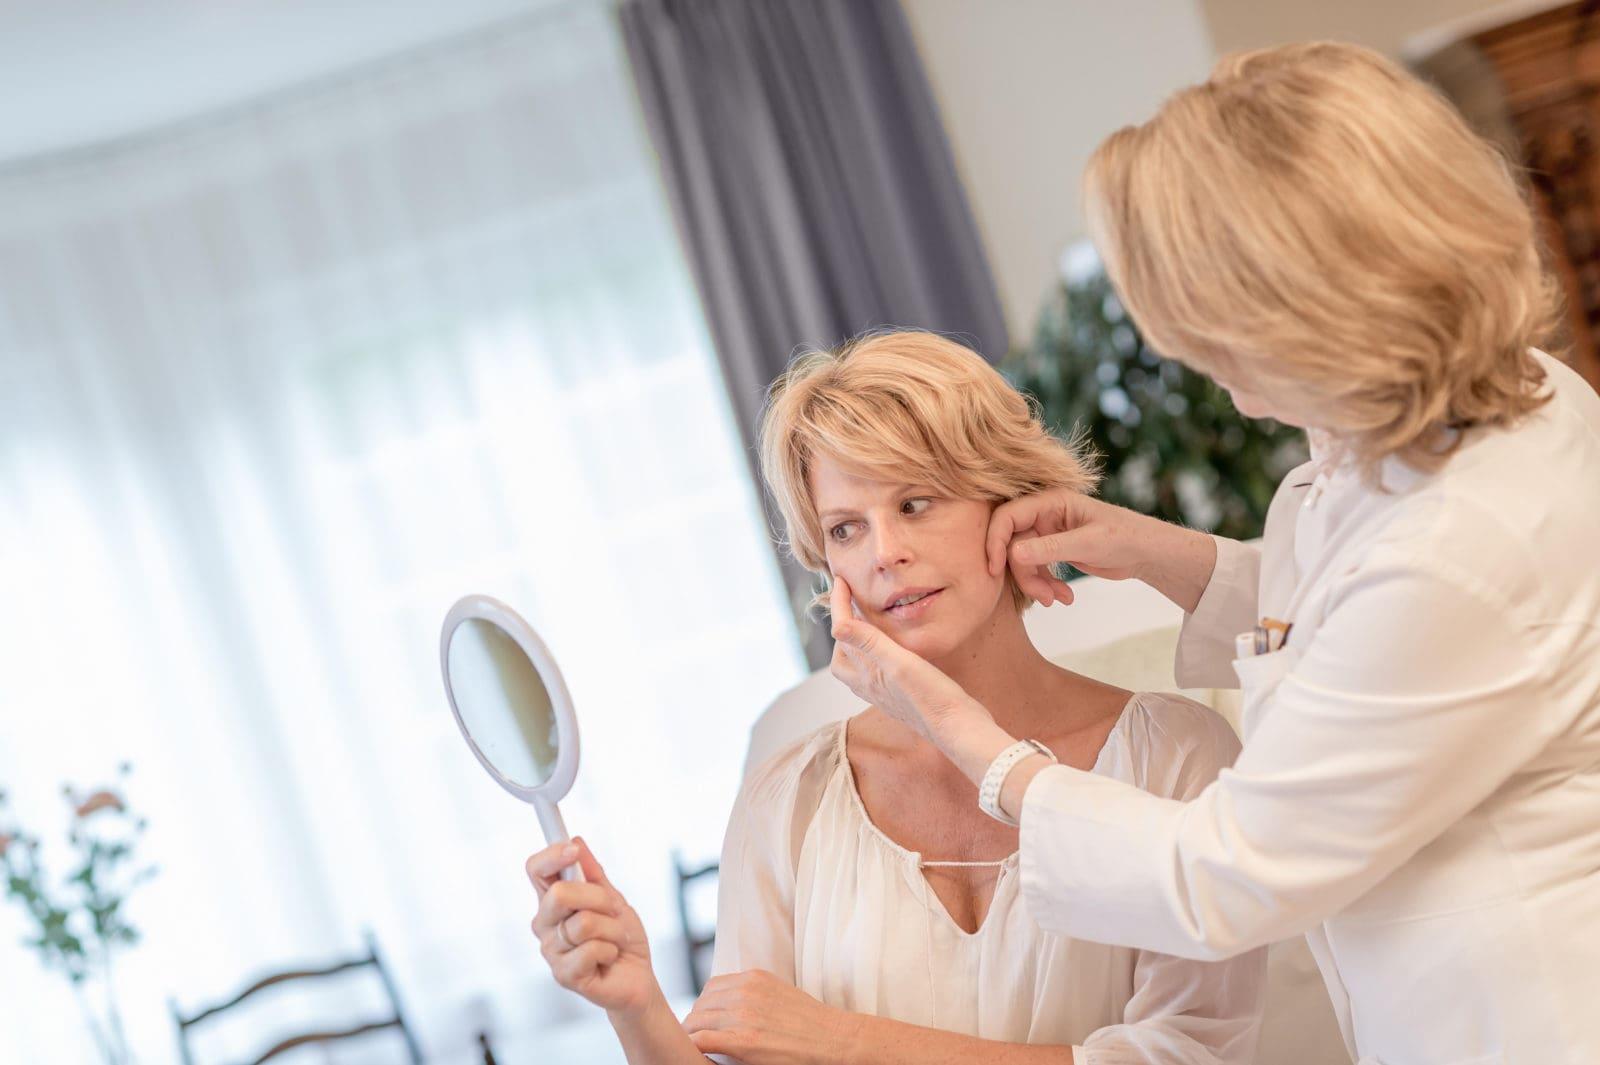 Ästhetik Untersuchung Kosmetik